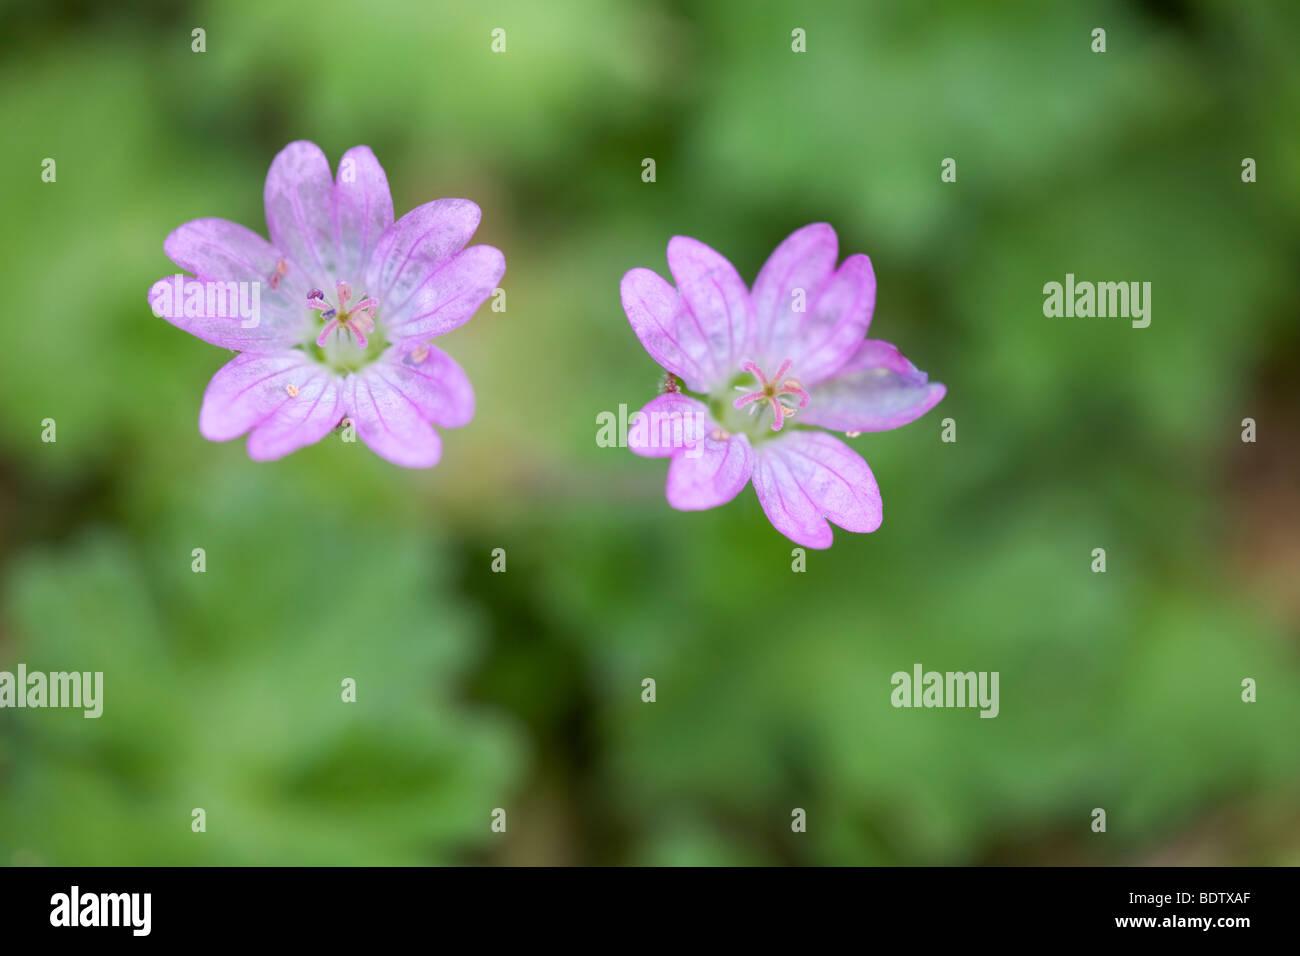 Weicher Storchschnabel / Dove s-foot Cranes-bill - (Dovefoot) / Geranium molle - Stock Image